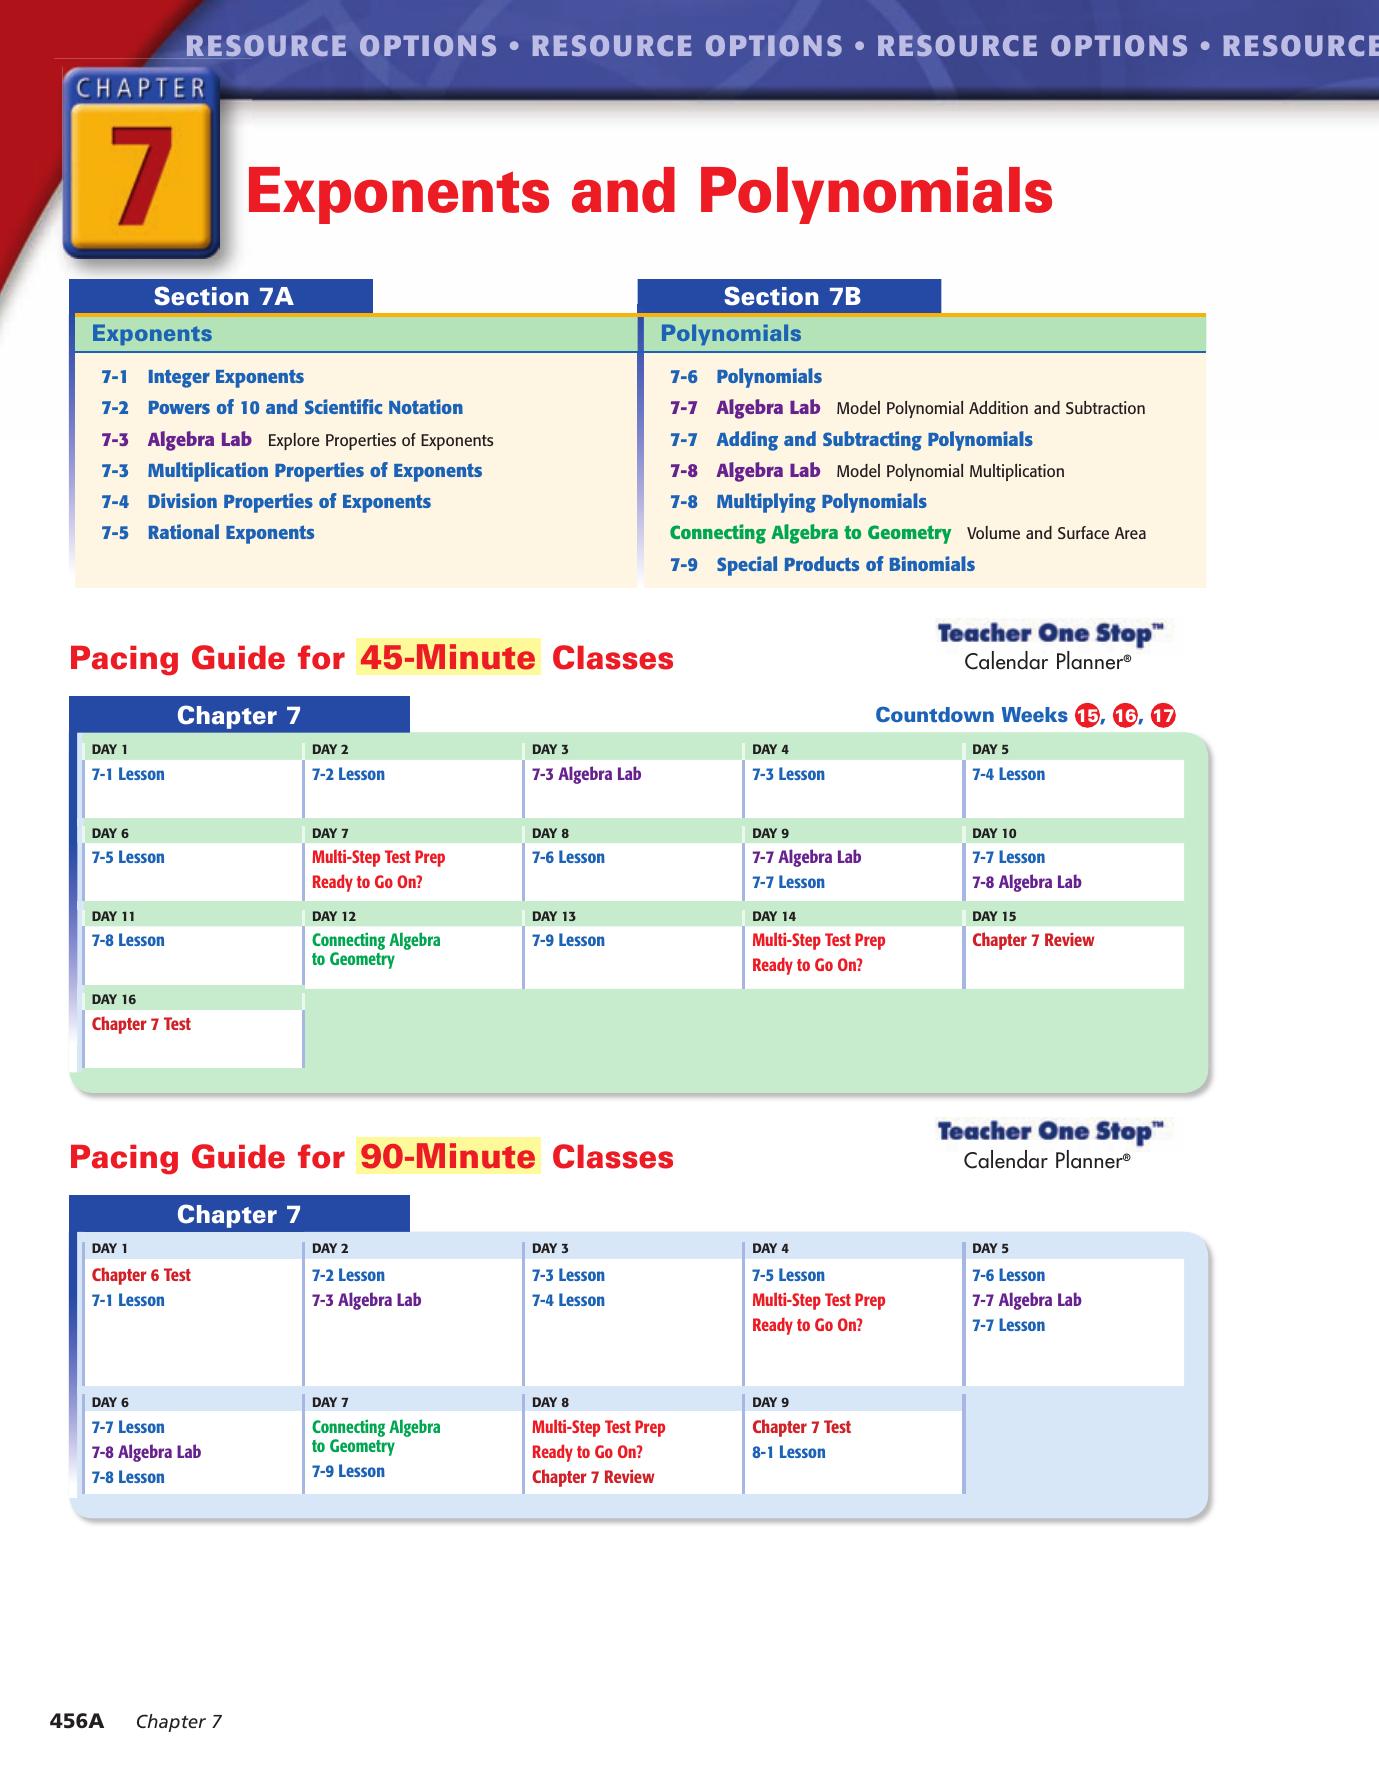 7 - Spokane Public Schools